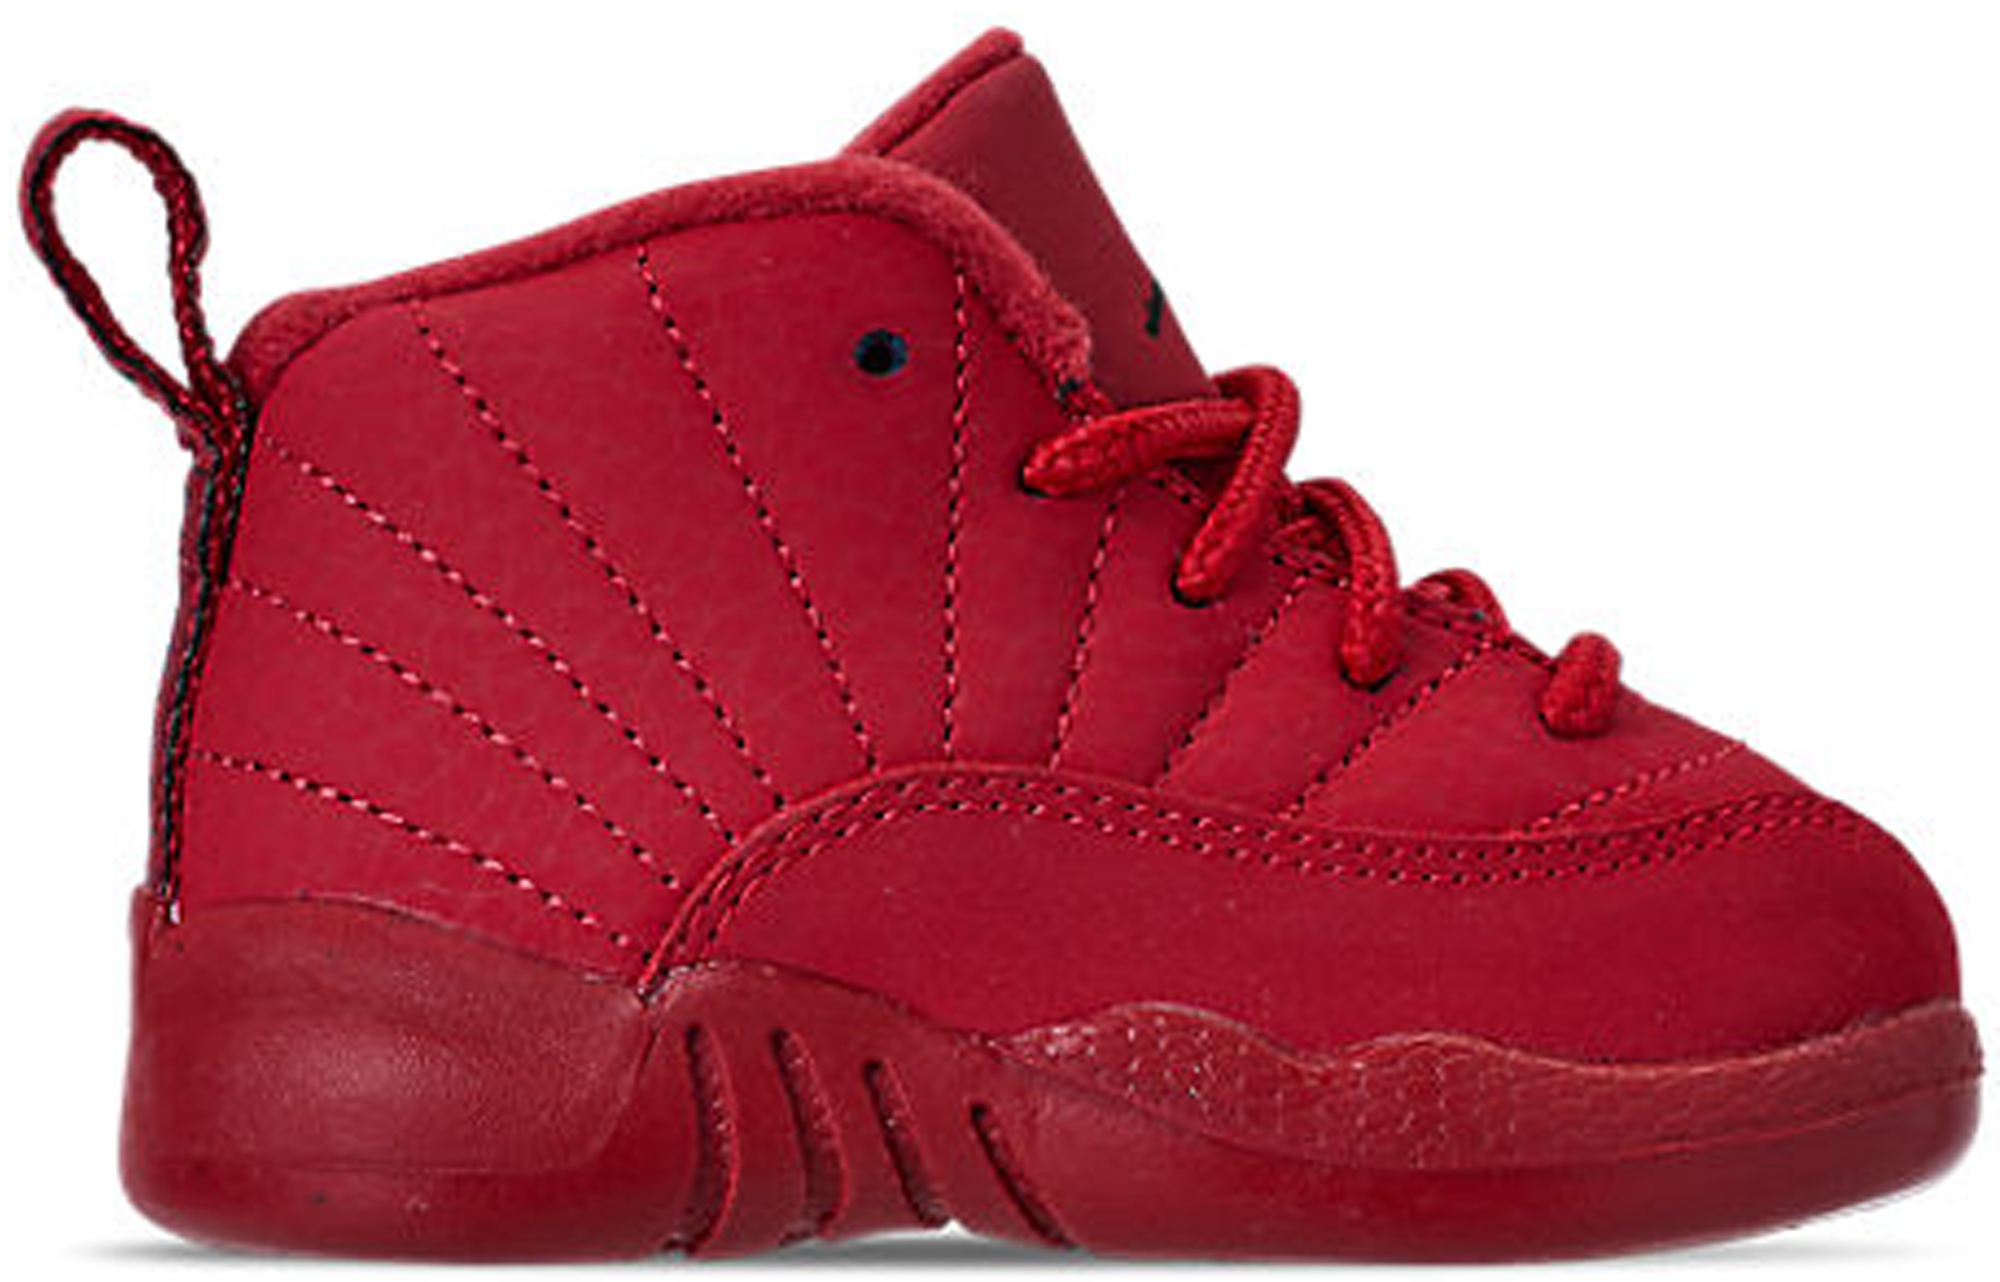 Jordan 12 Retro Gym Red 2018 (TD)